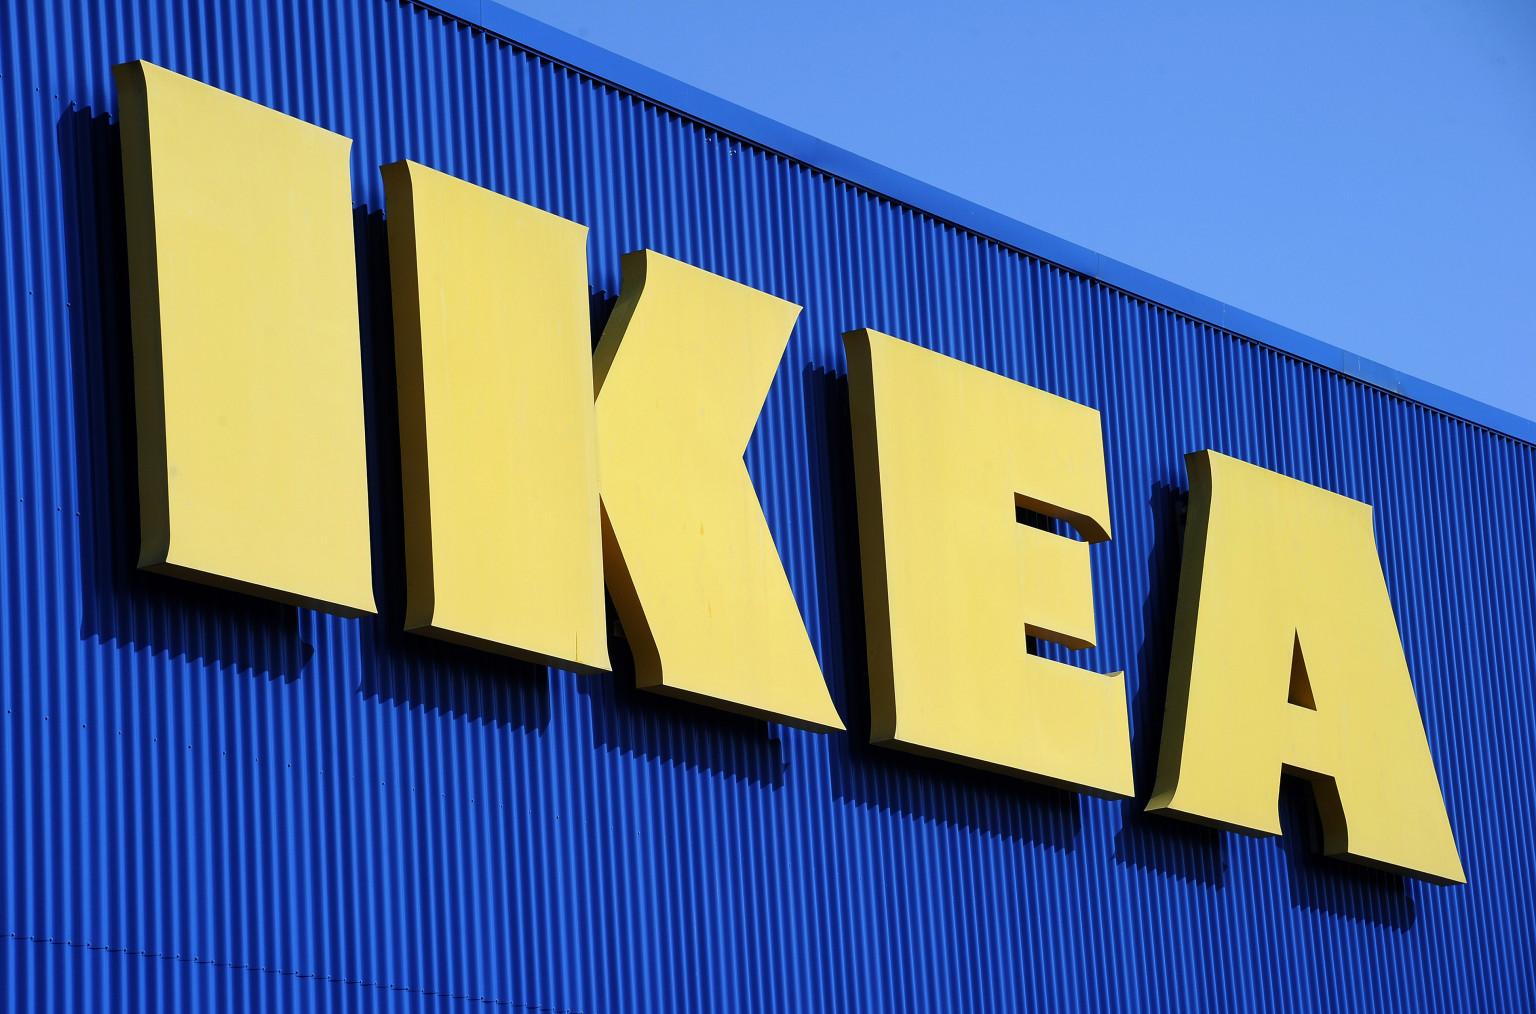 FRANCE-ECONOMY-SWEDEN-IKEA